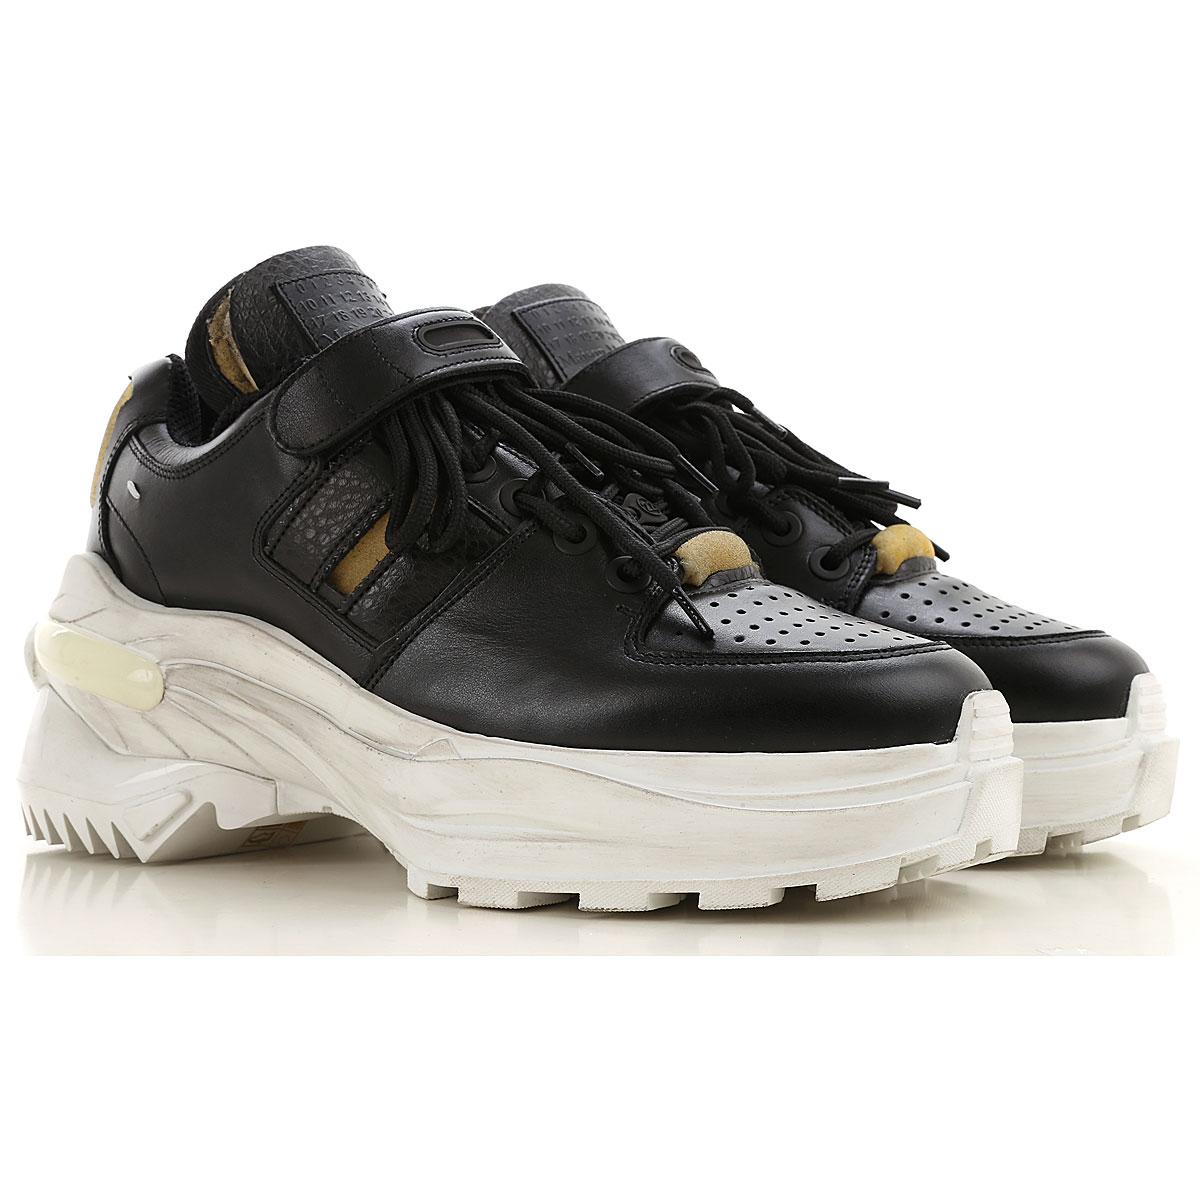 Maison Martin Margiela Mens Shoes On Sale, Black, Leather, 2019, 10 6.5 7.5 8 9